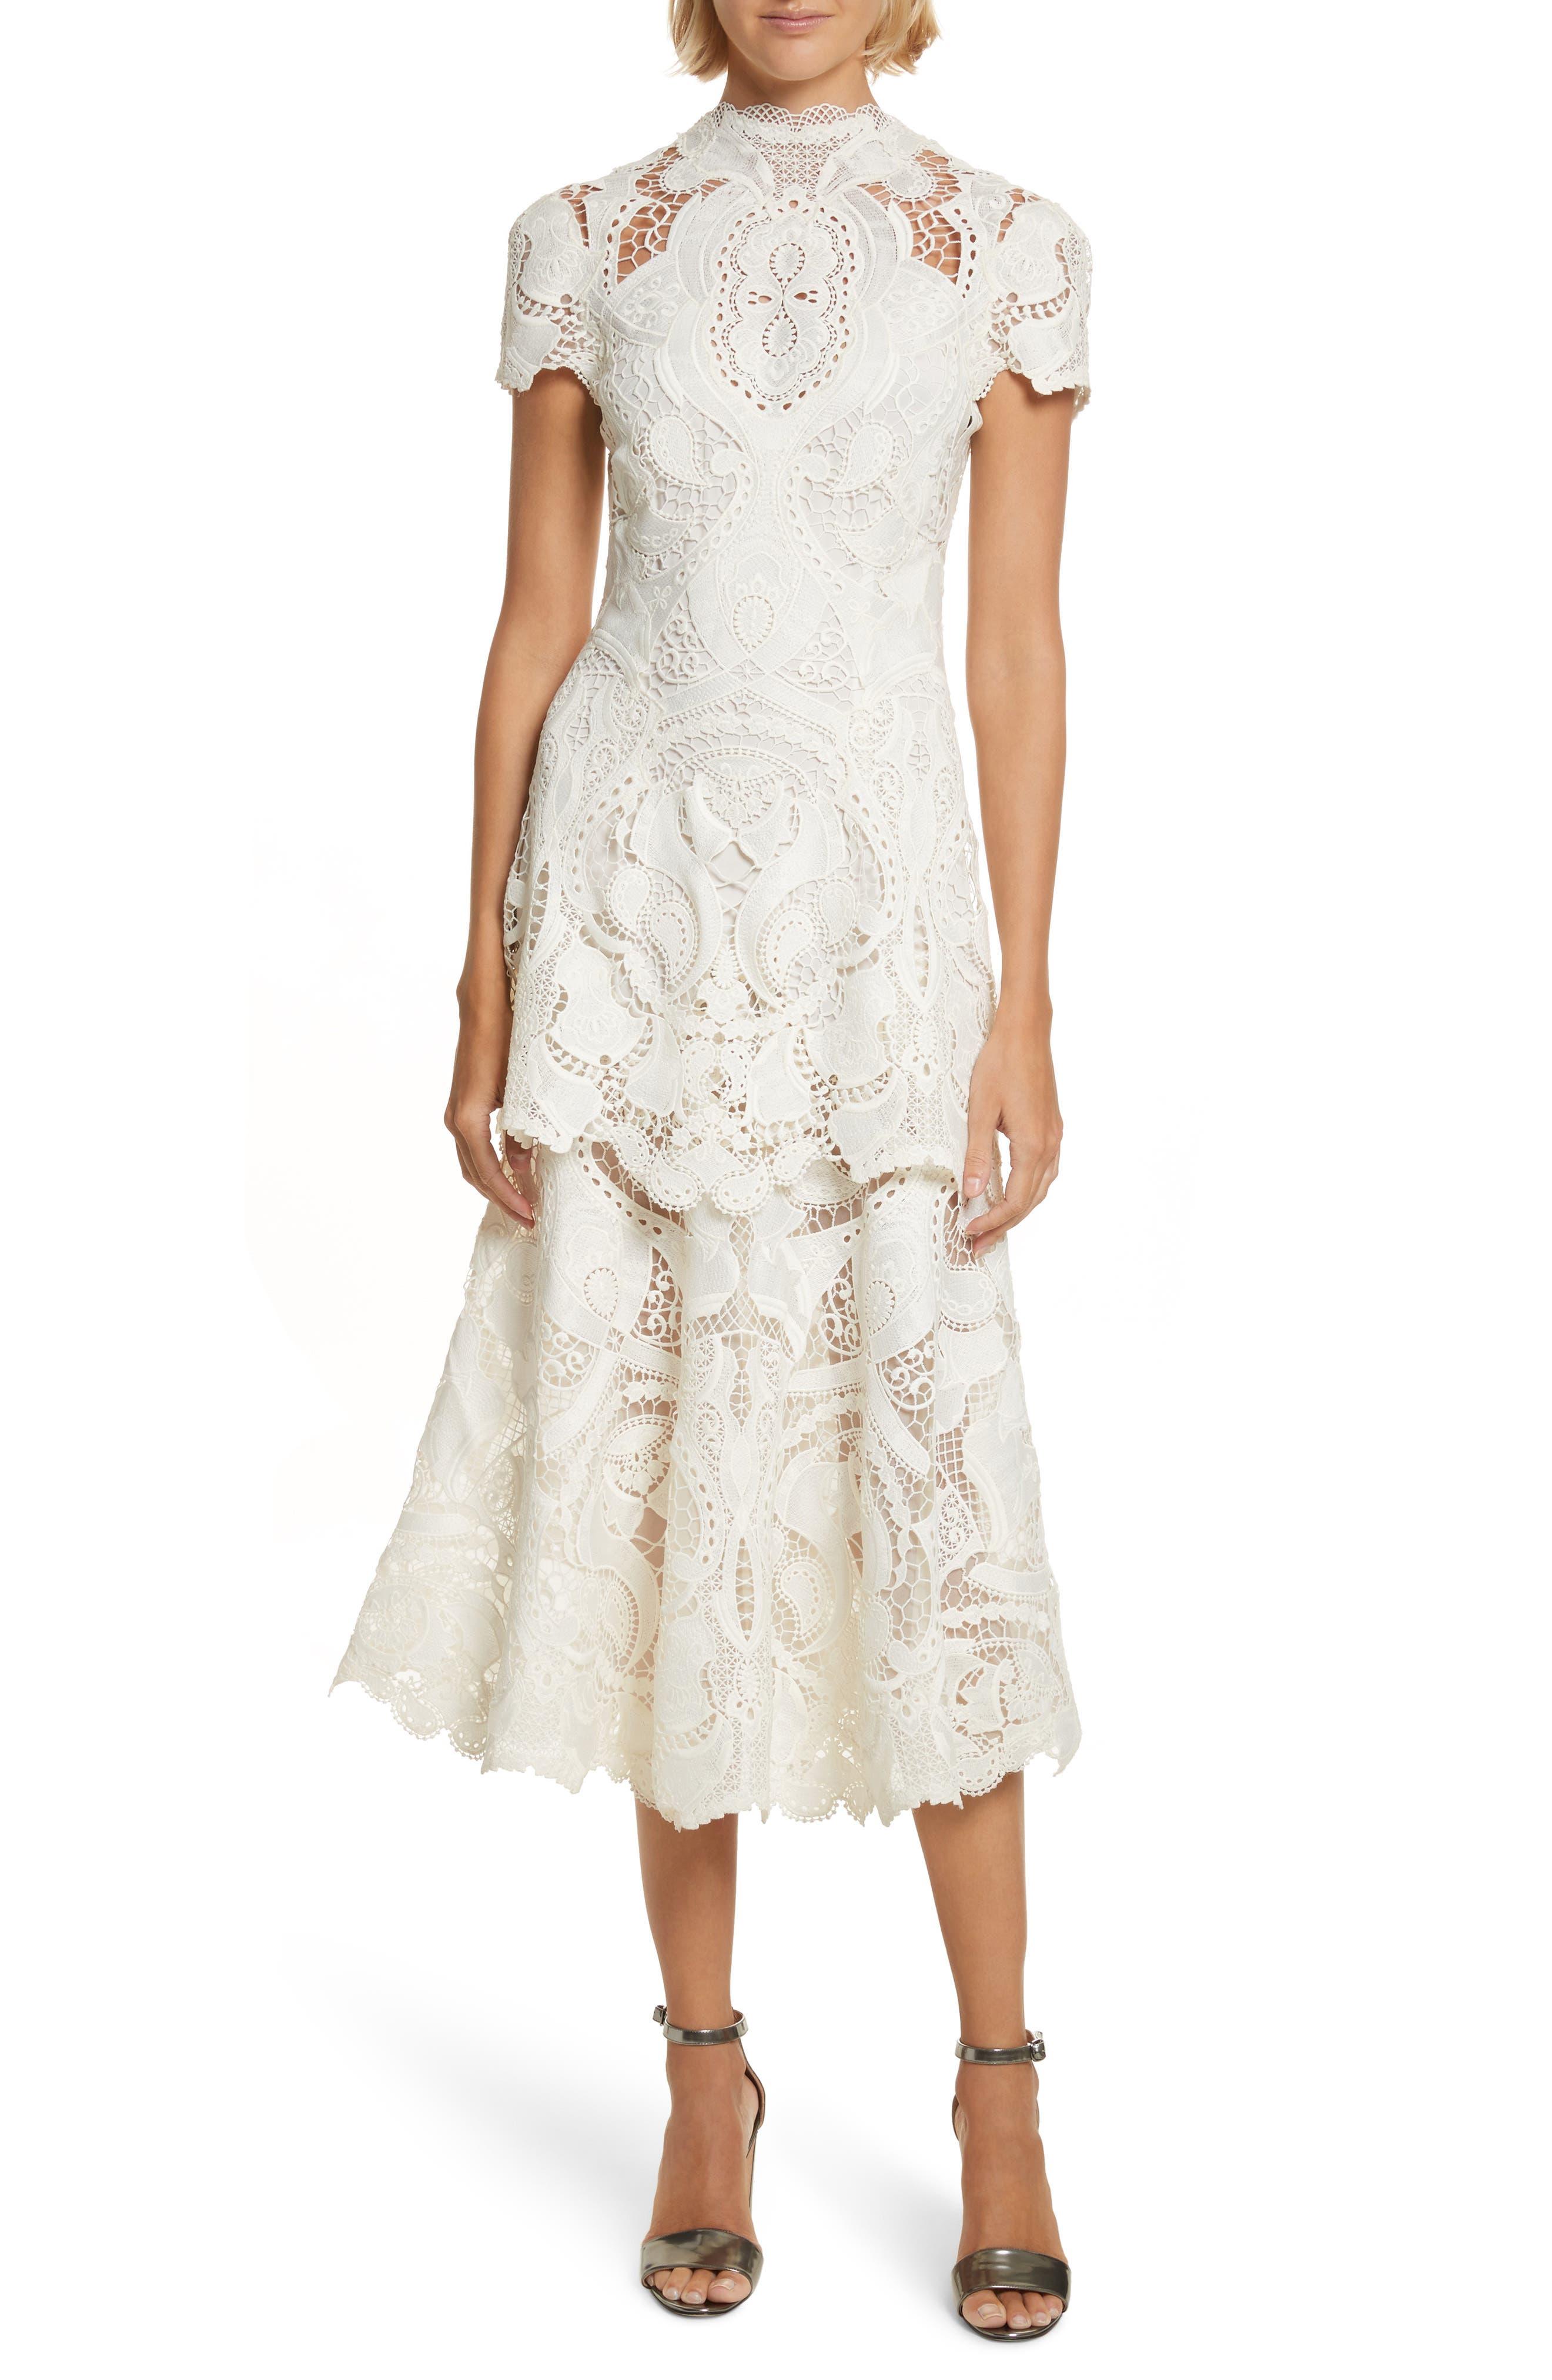 Main Image - Jonathan Simkhai Appliqué Lace Midi Dress